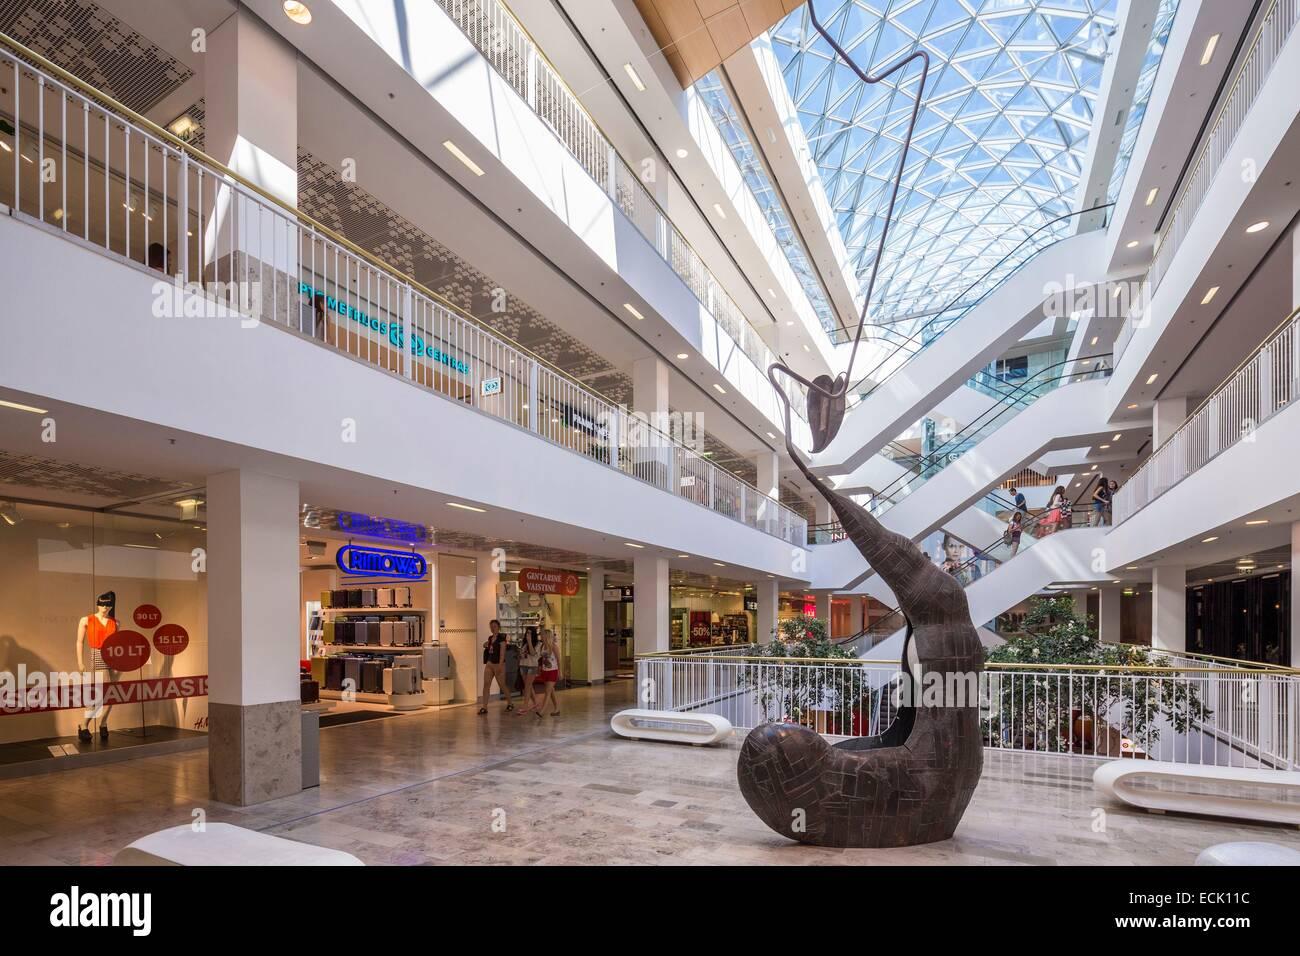 Lithuania (Baltic States), Vilnius, the Gedimino 9 shopping mall, Gedimino prospekta 9 - Stock Image